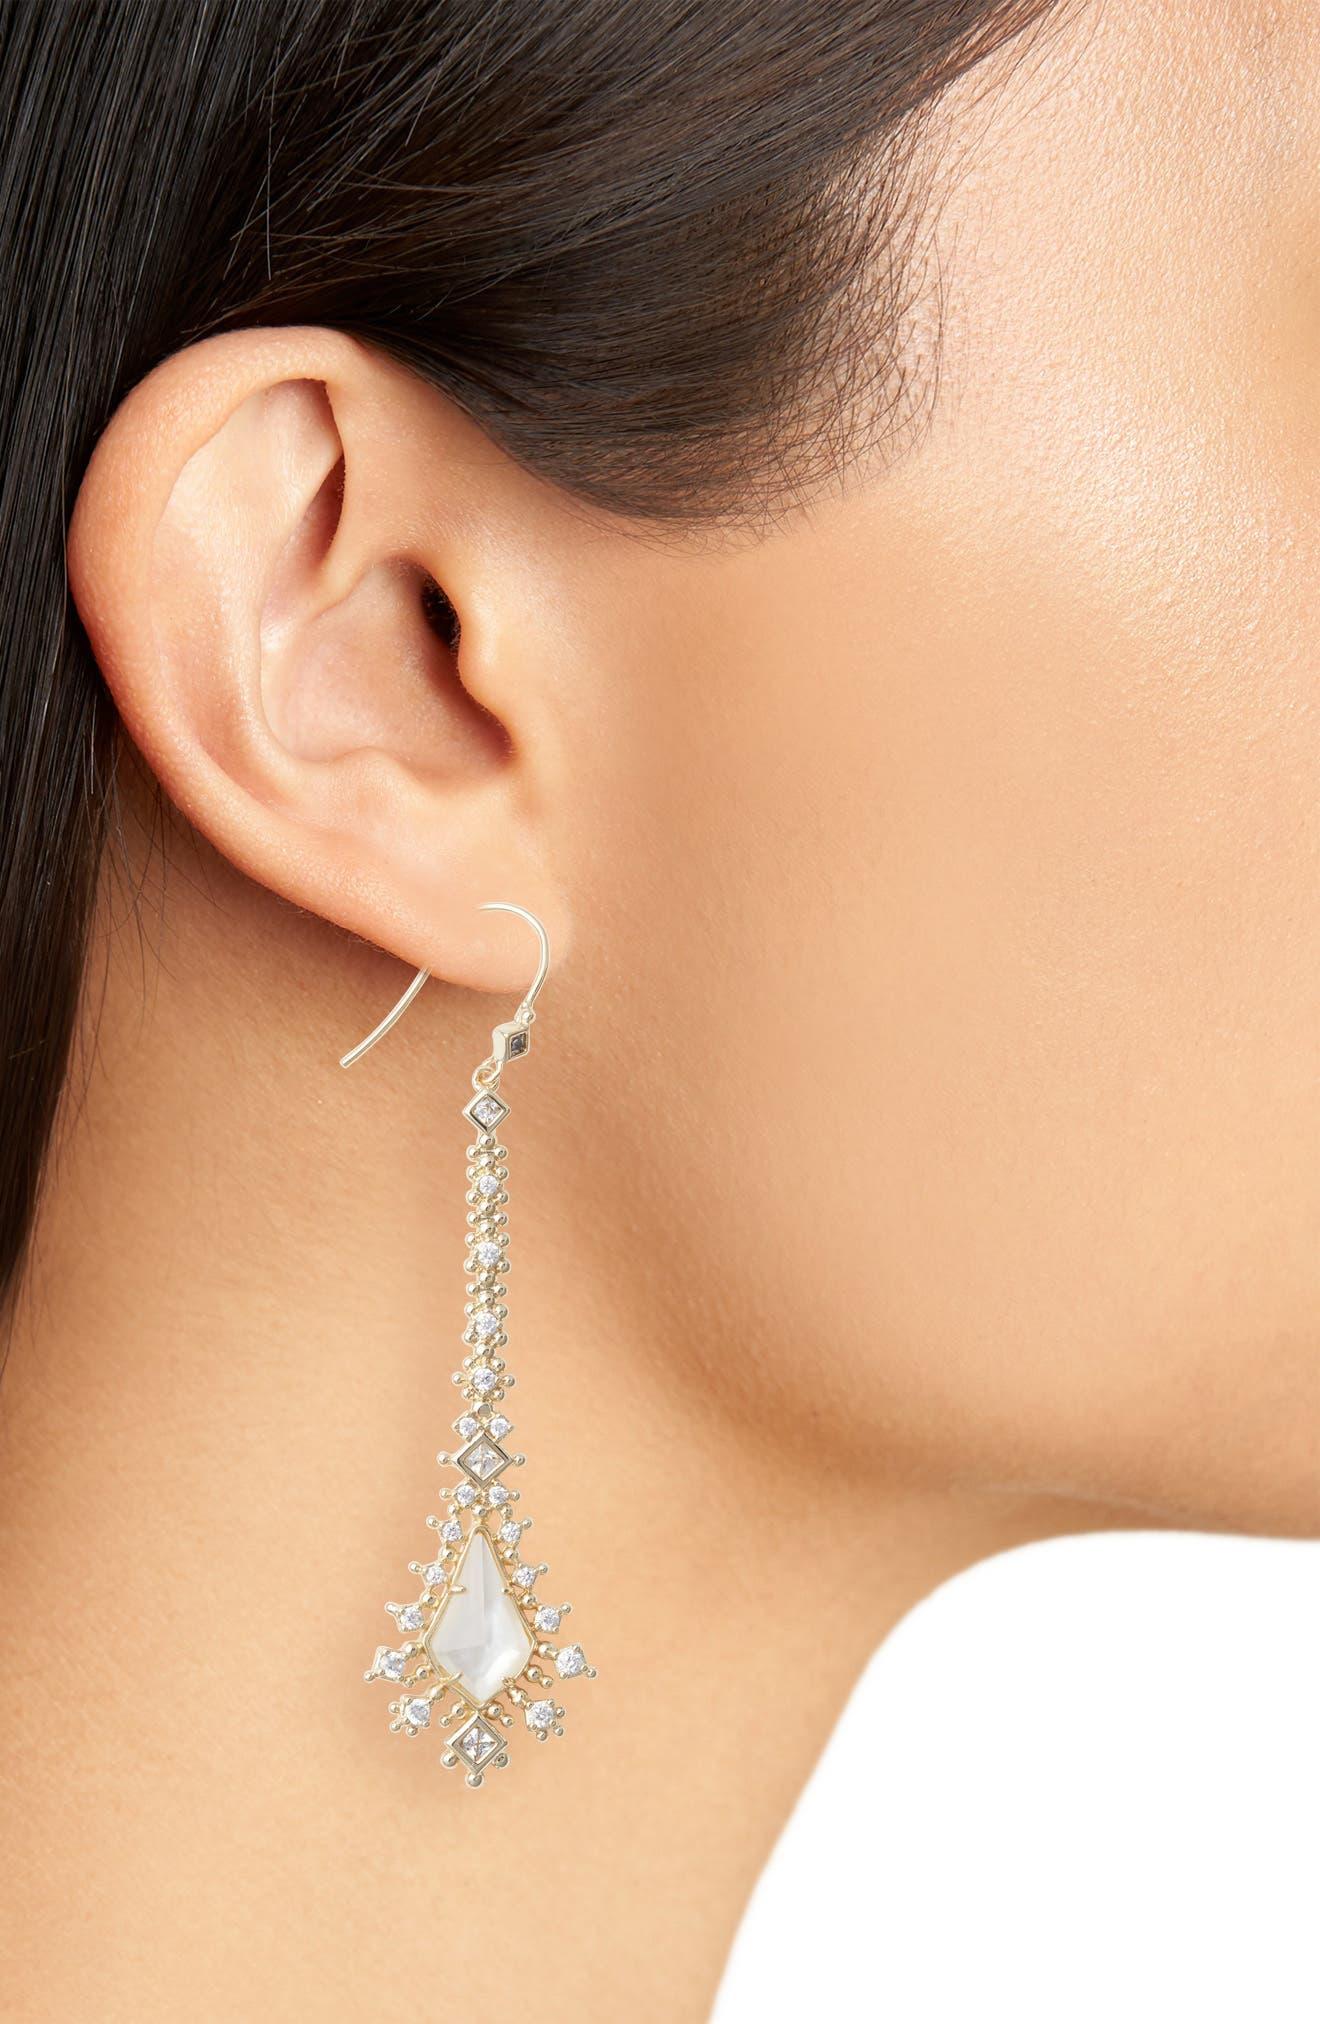 Reimer Mother of Pearl Drop Earrings,                             Alternate thumbnail 6, color,